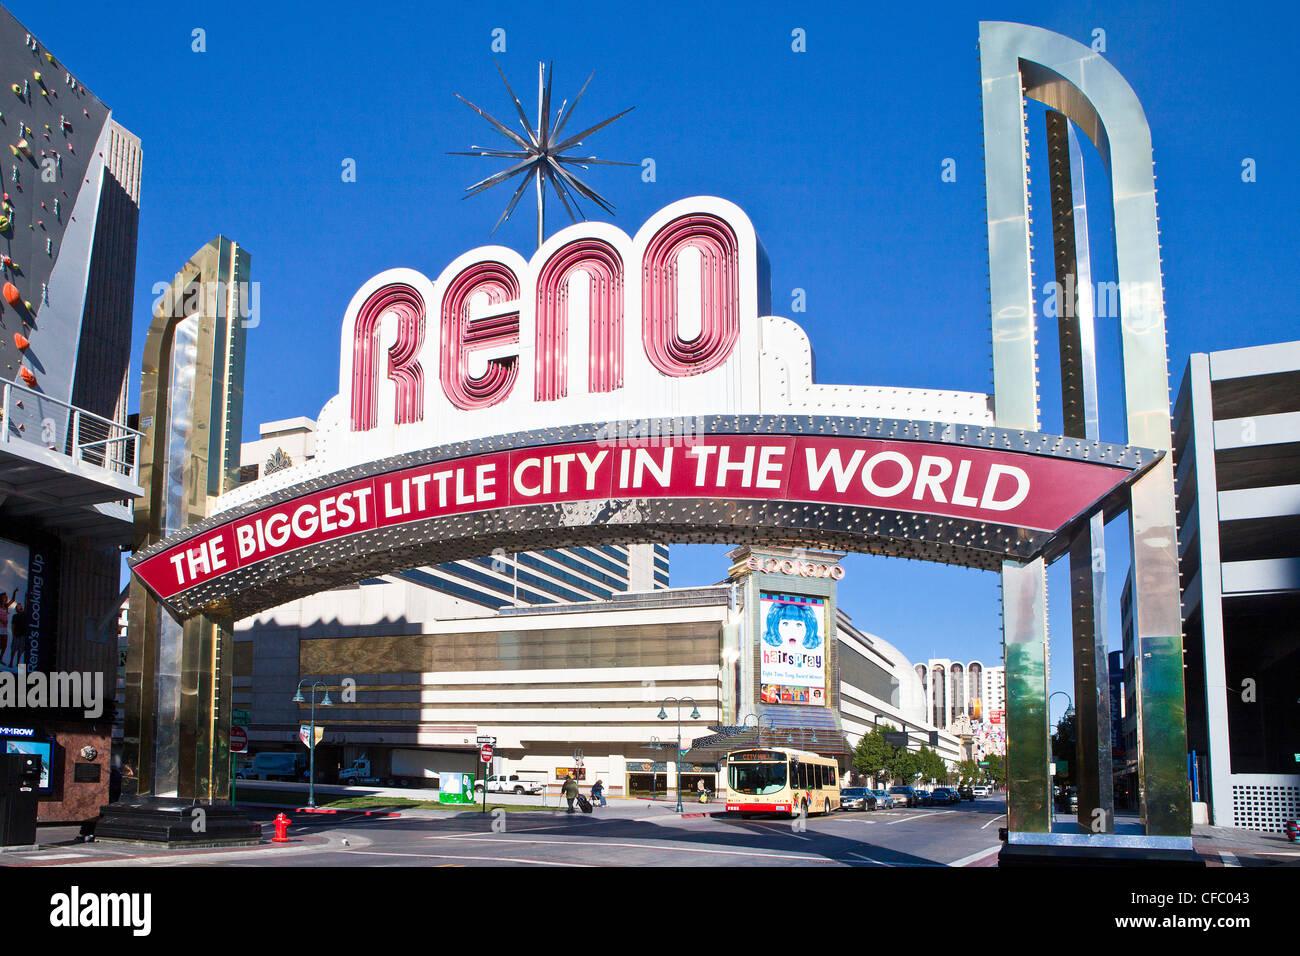 USA, United States, America, Nevada, Reno, City, casino, entrance, famous, gambling, sign, type, touristic, travel - Stock Image